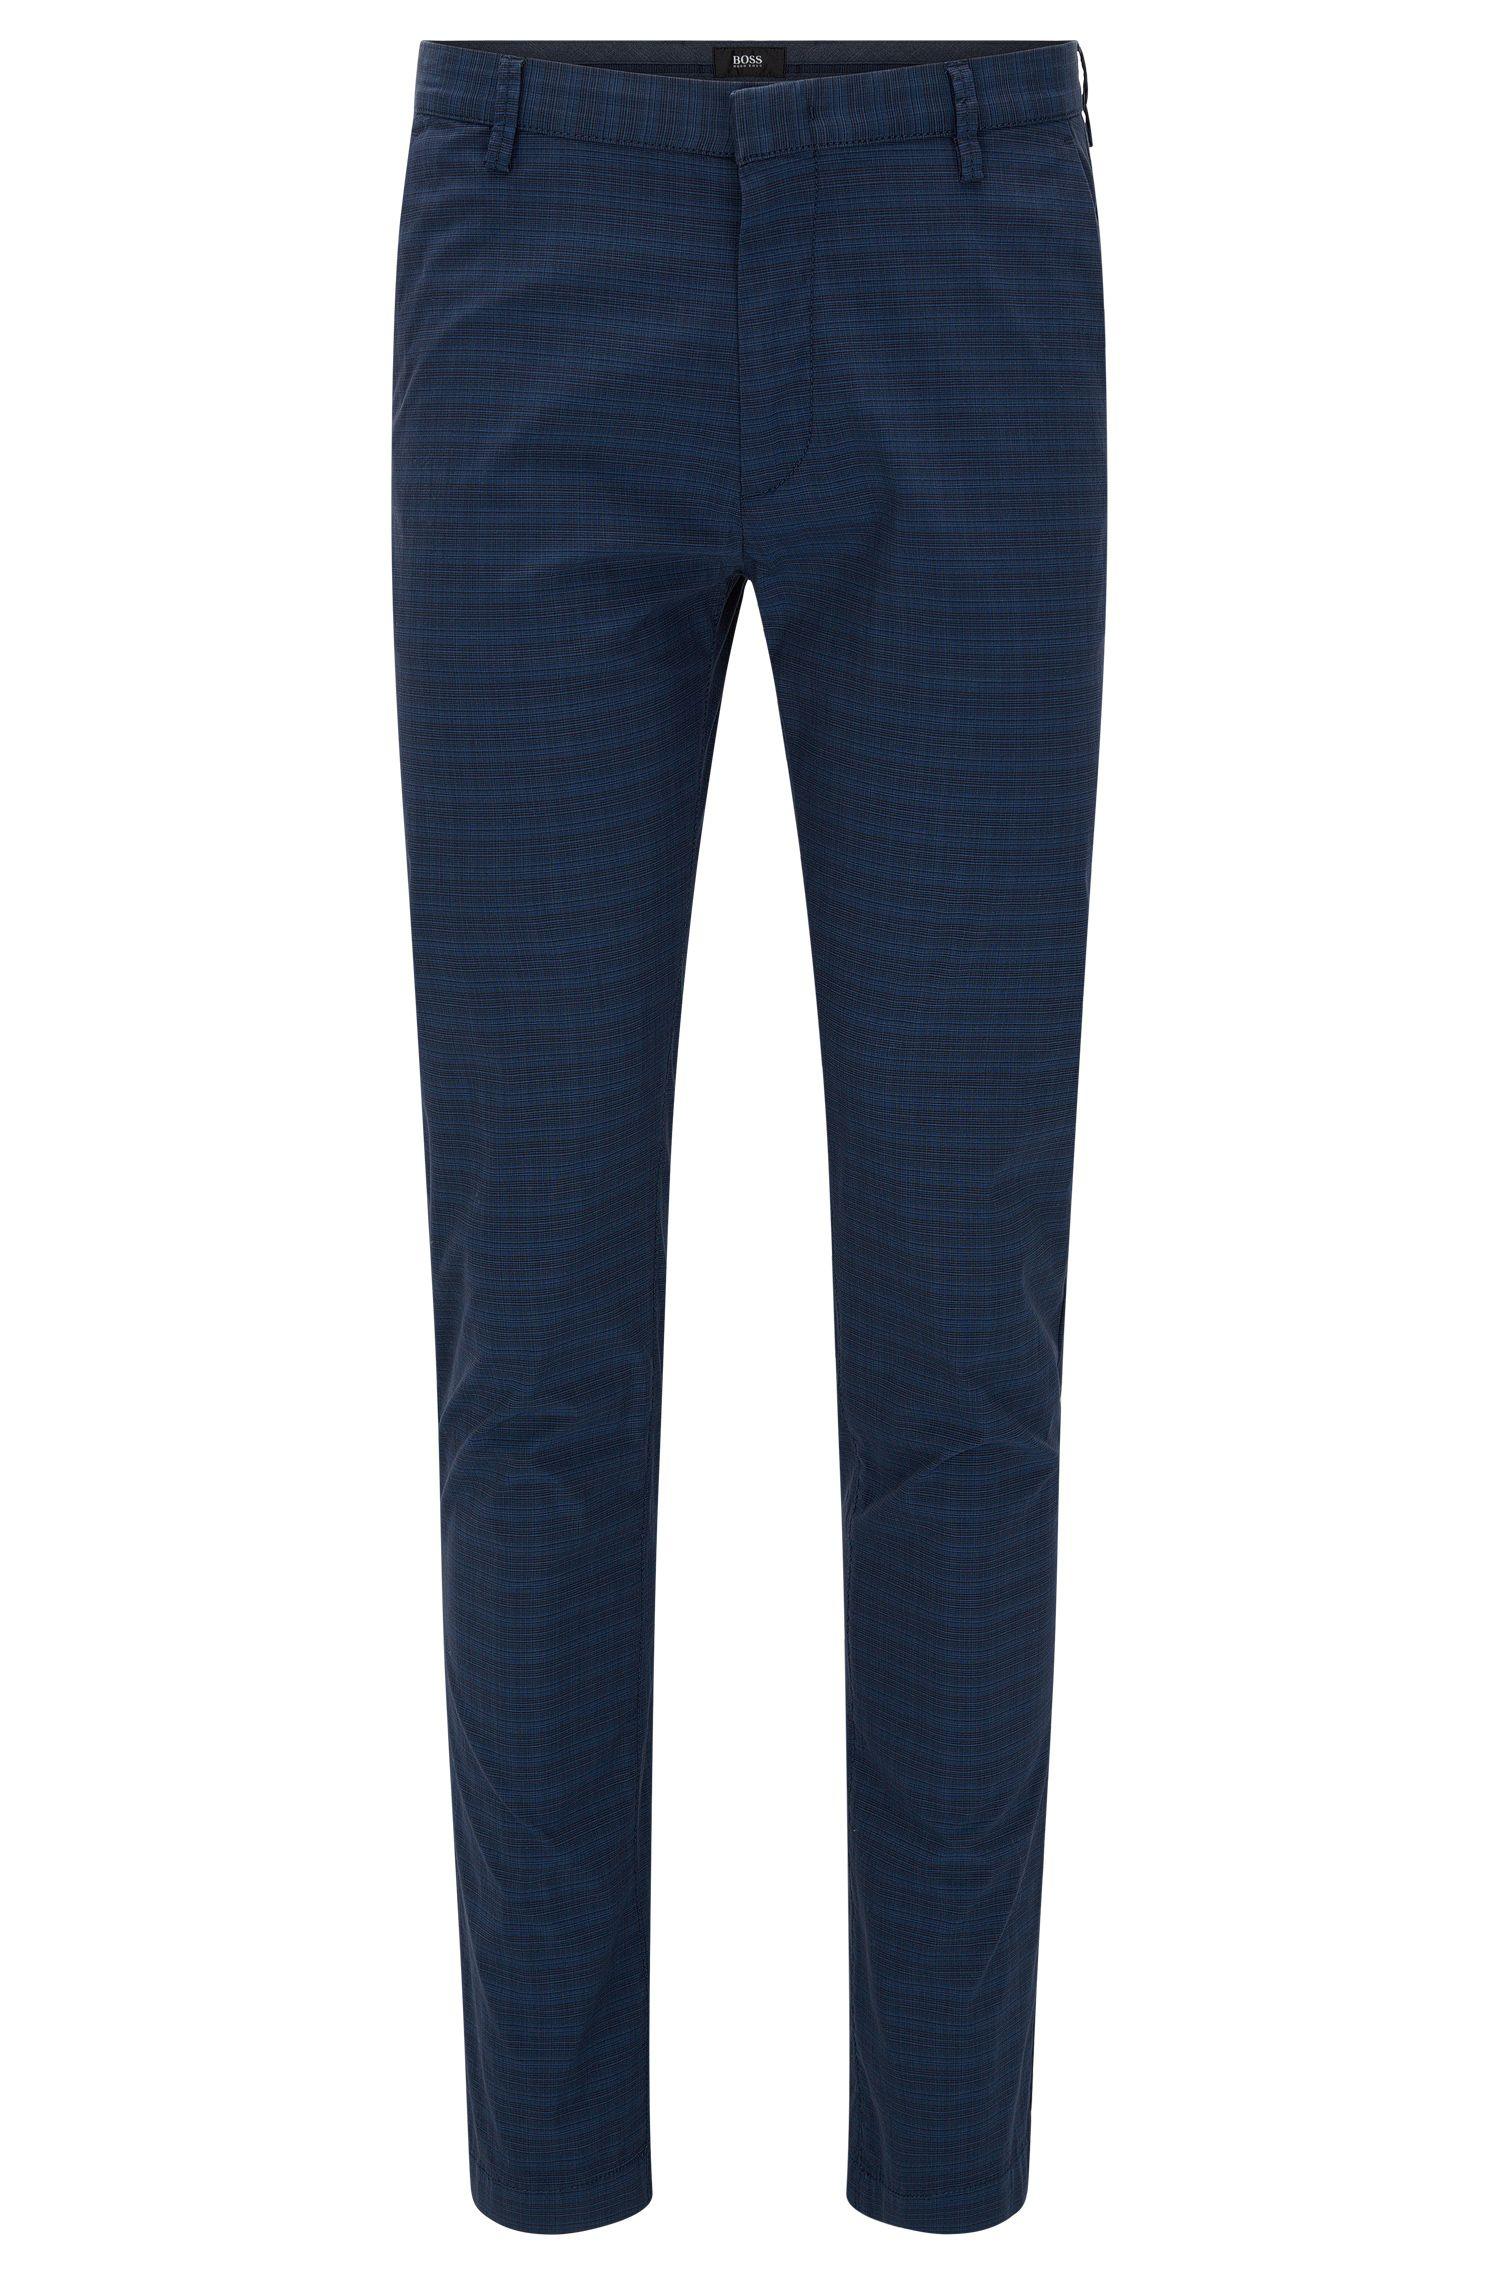 'Rice-W' | Slim Fit, Stretch Cotton Blend Pants